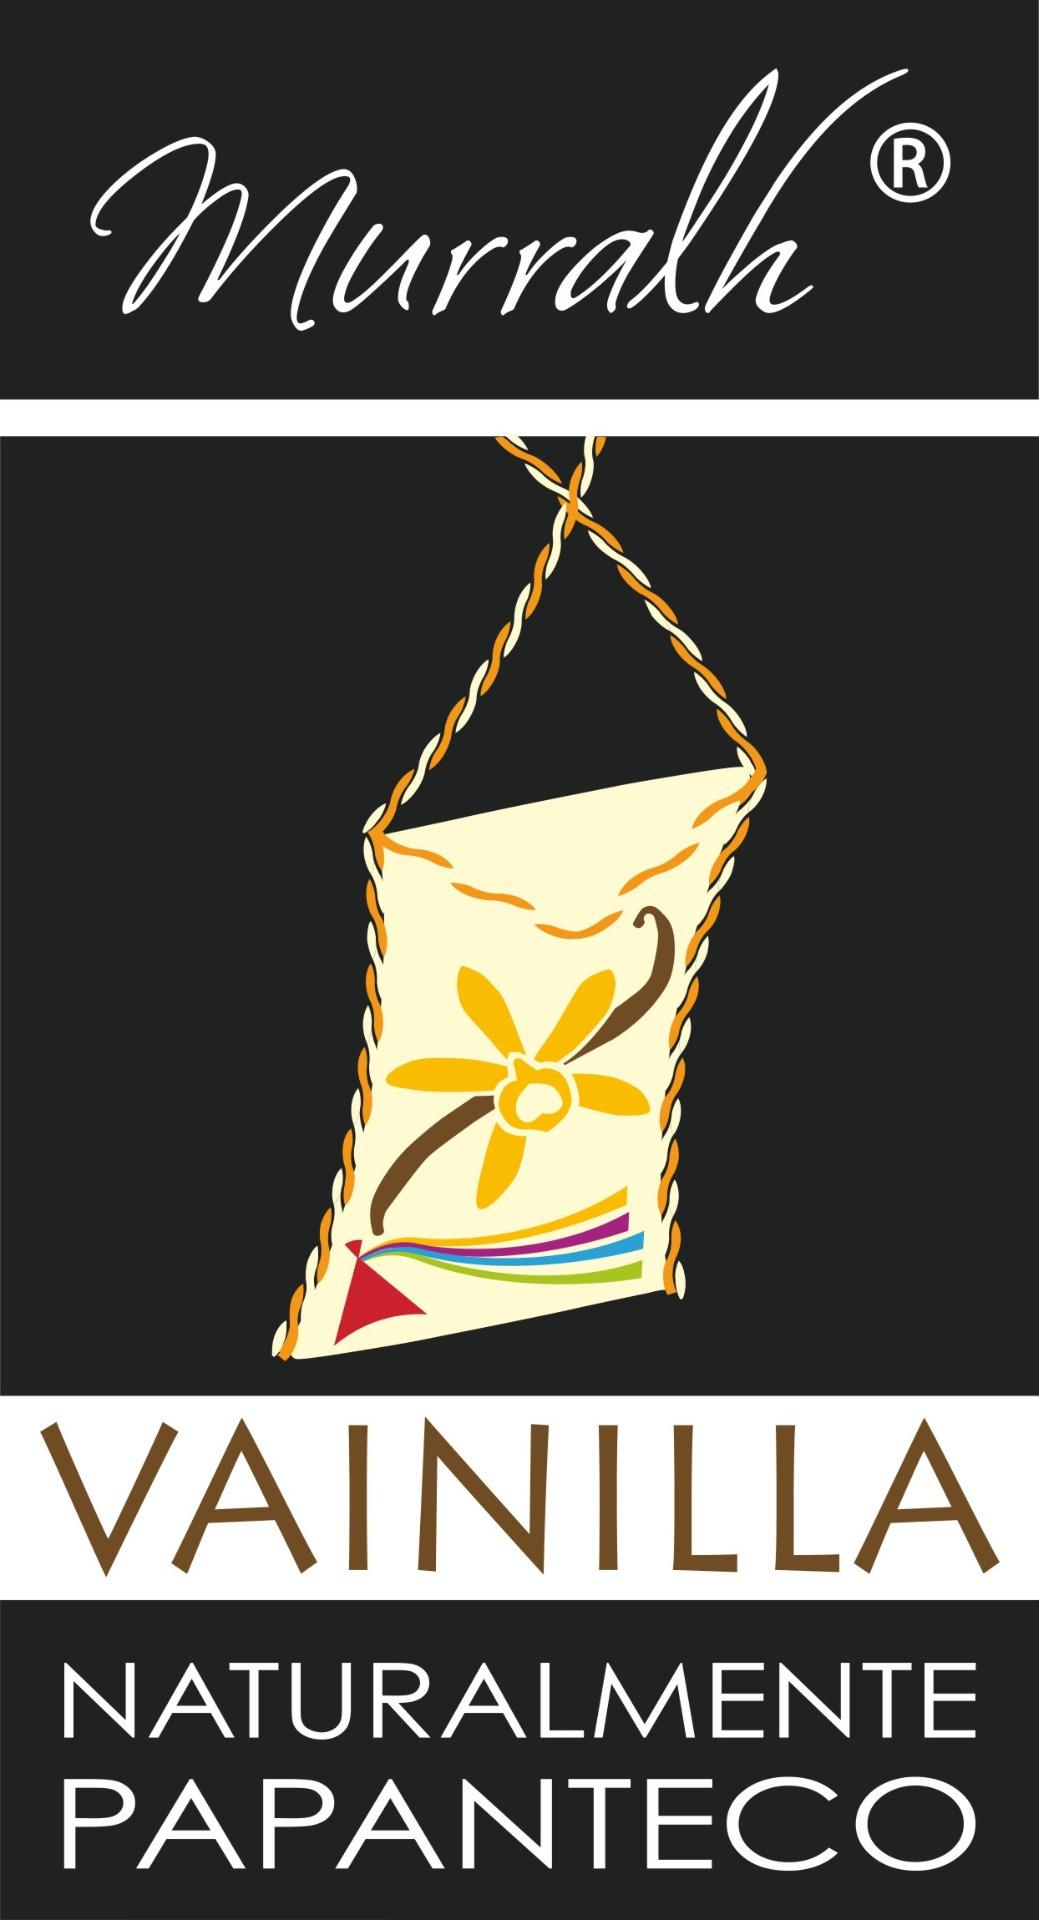 MURRALH-VAINILLA